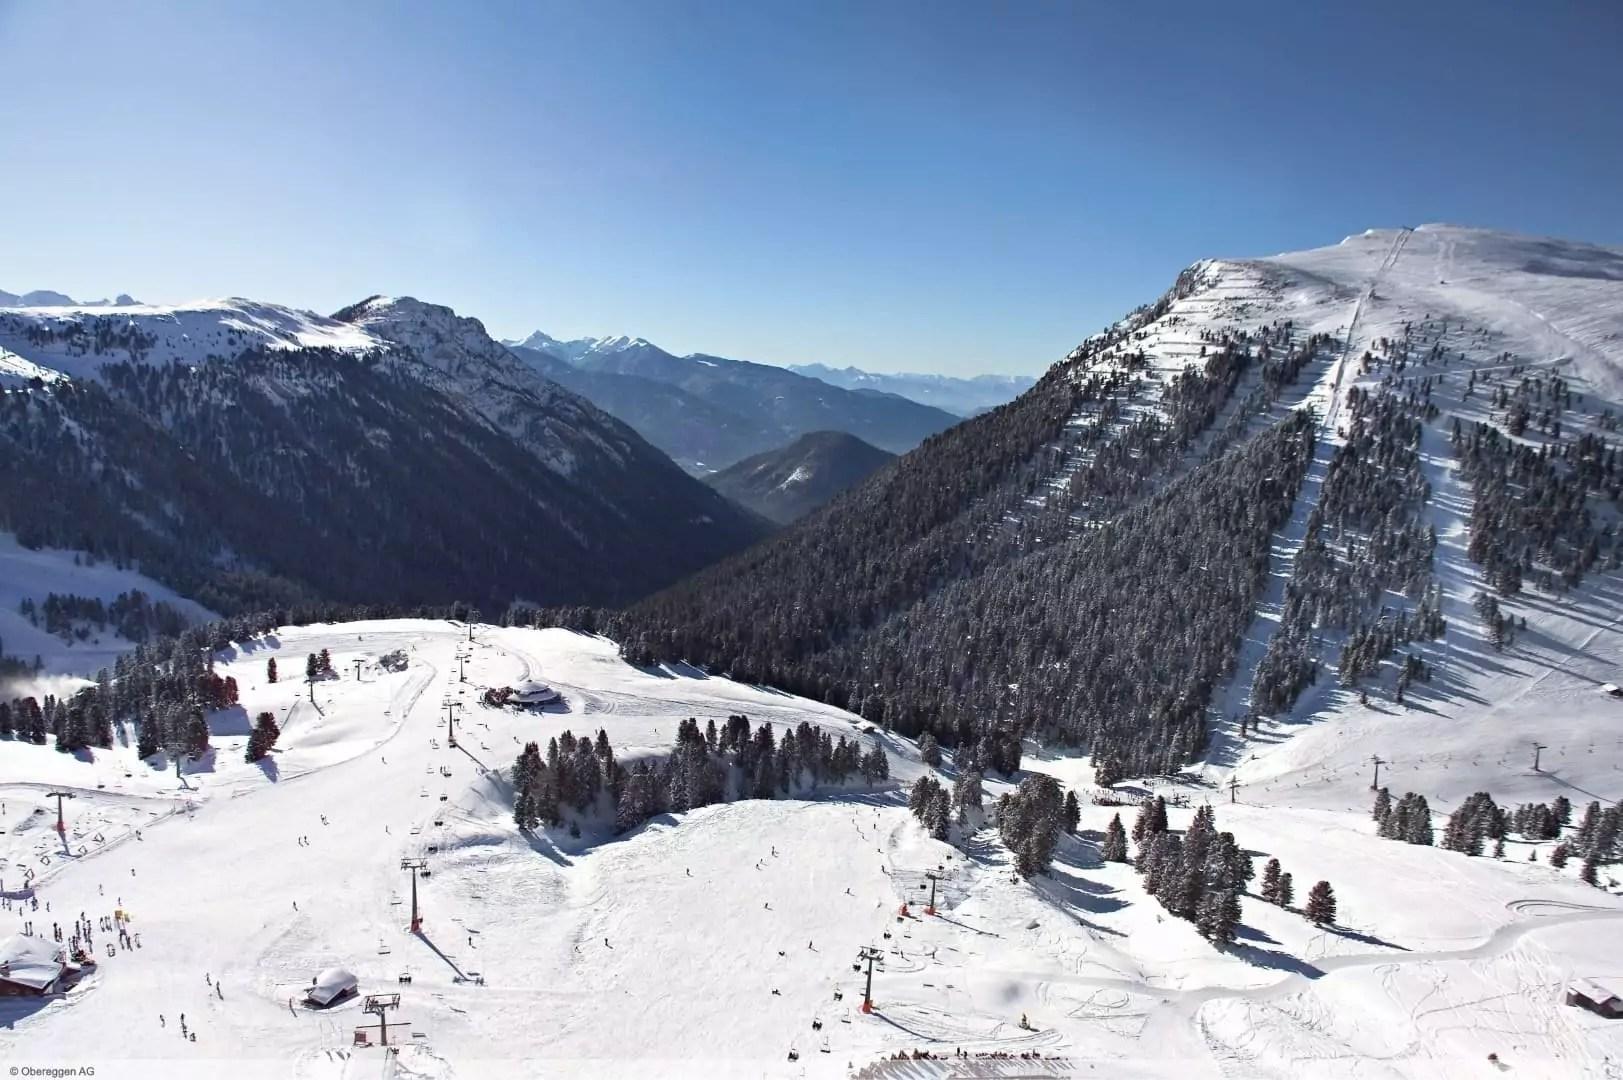 wintersport en aanbiedingen in Predazzo